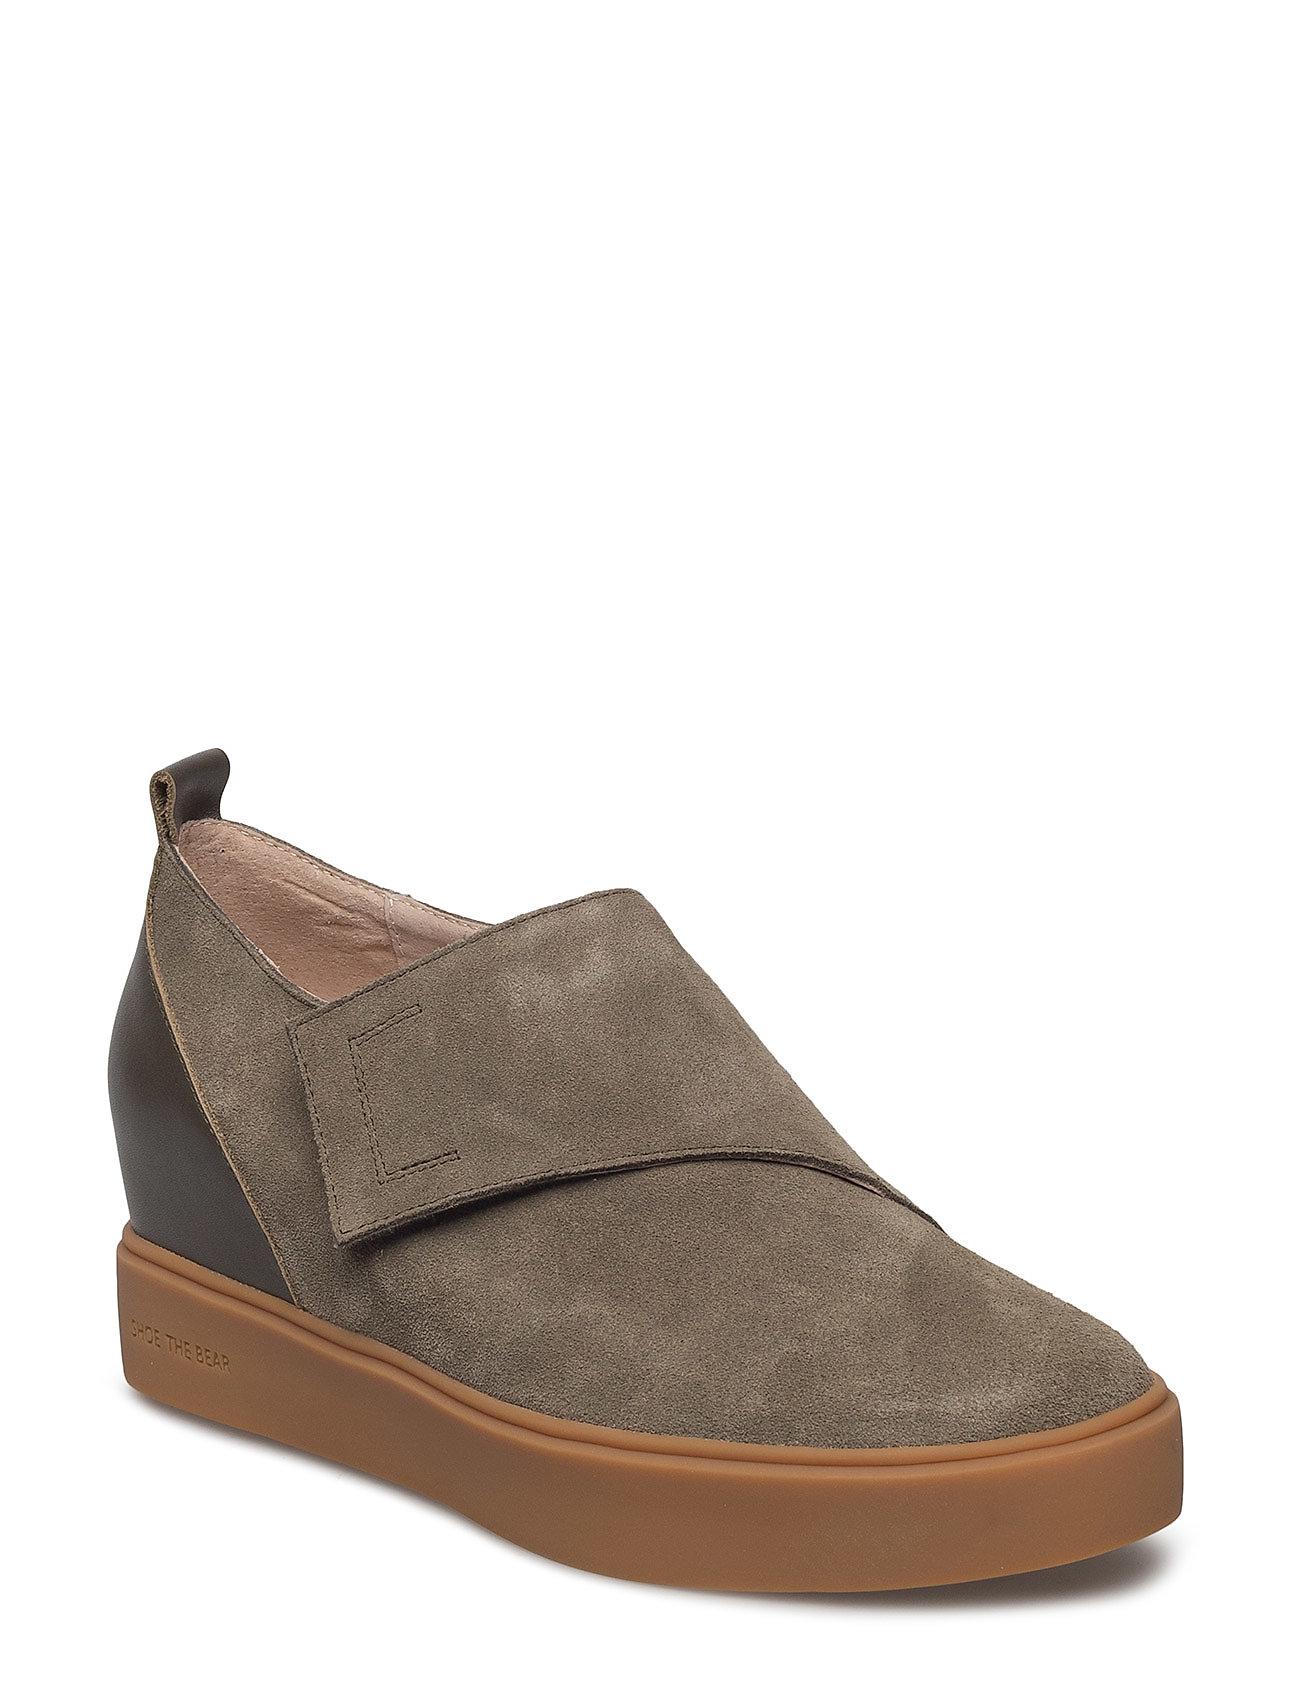 Image of Lisa S Sneakers Plateau Brun Shoe The Bear (3333153315)